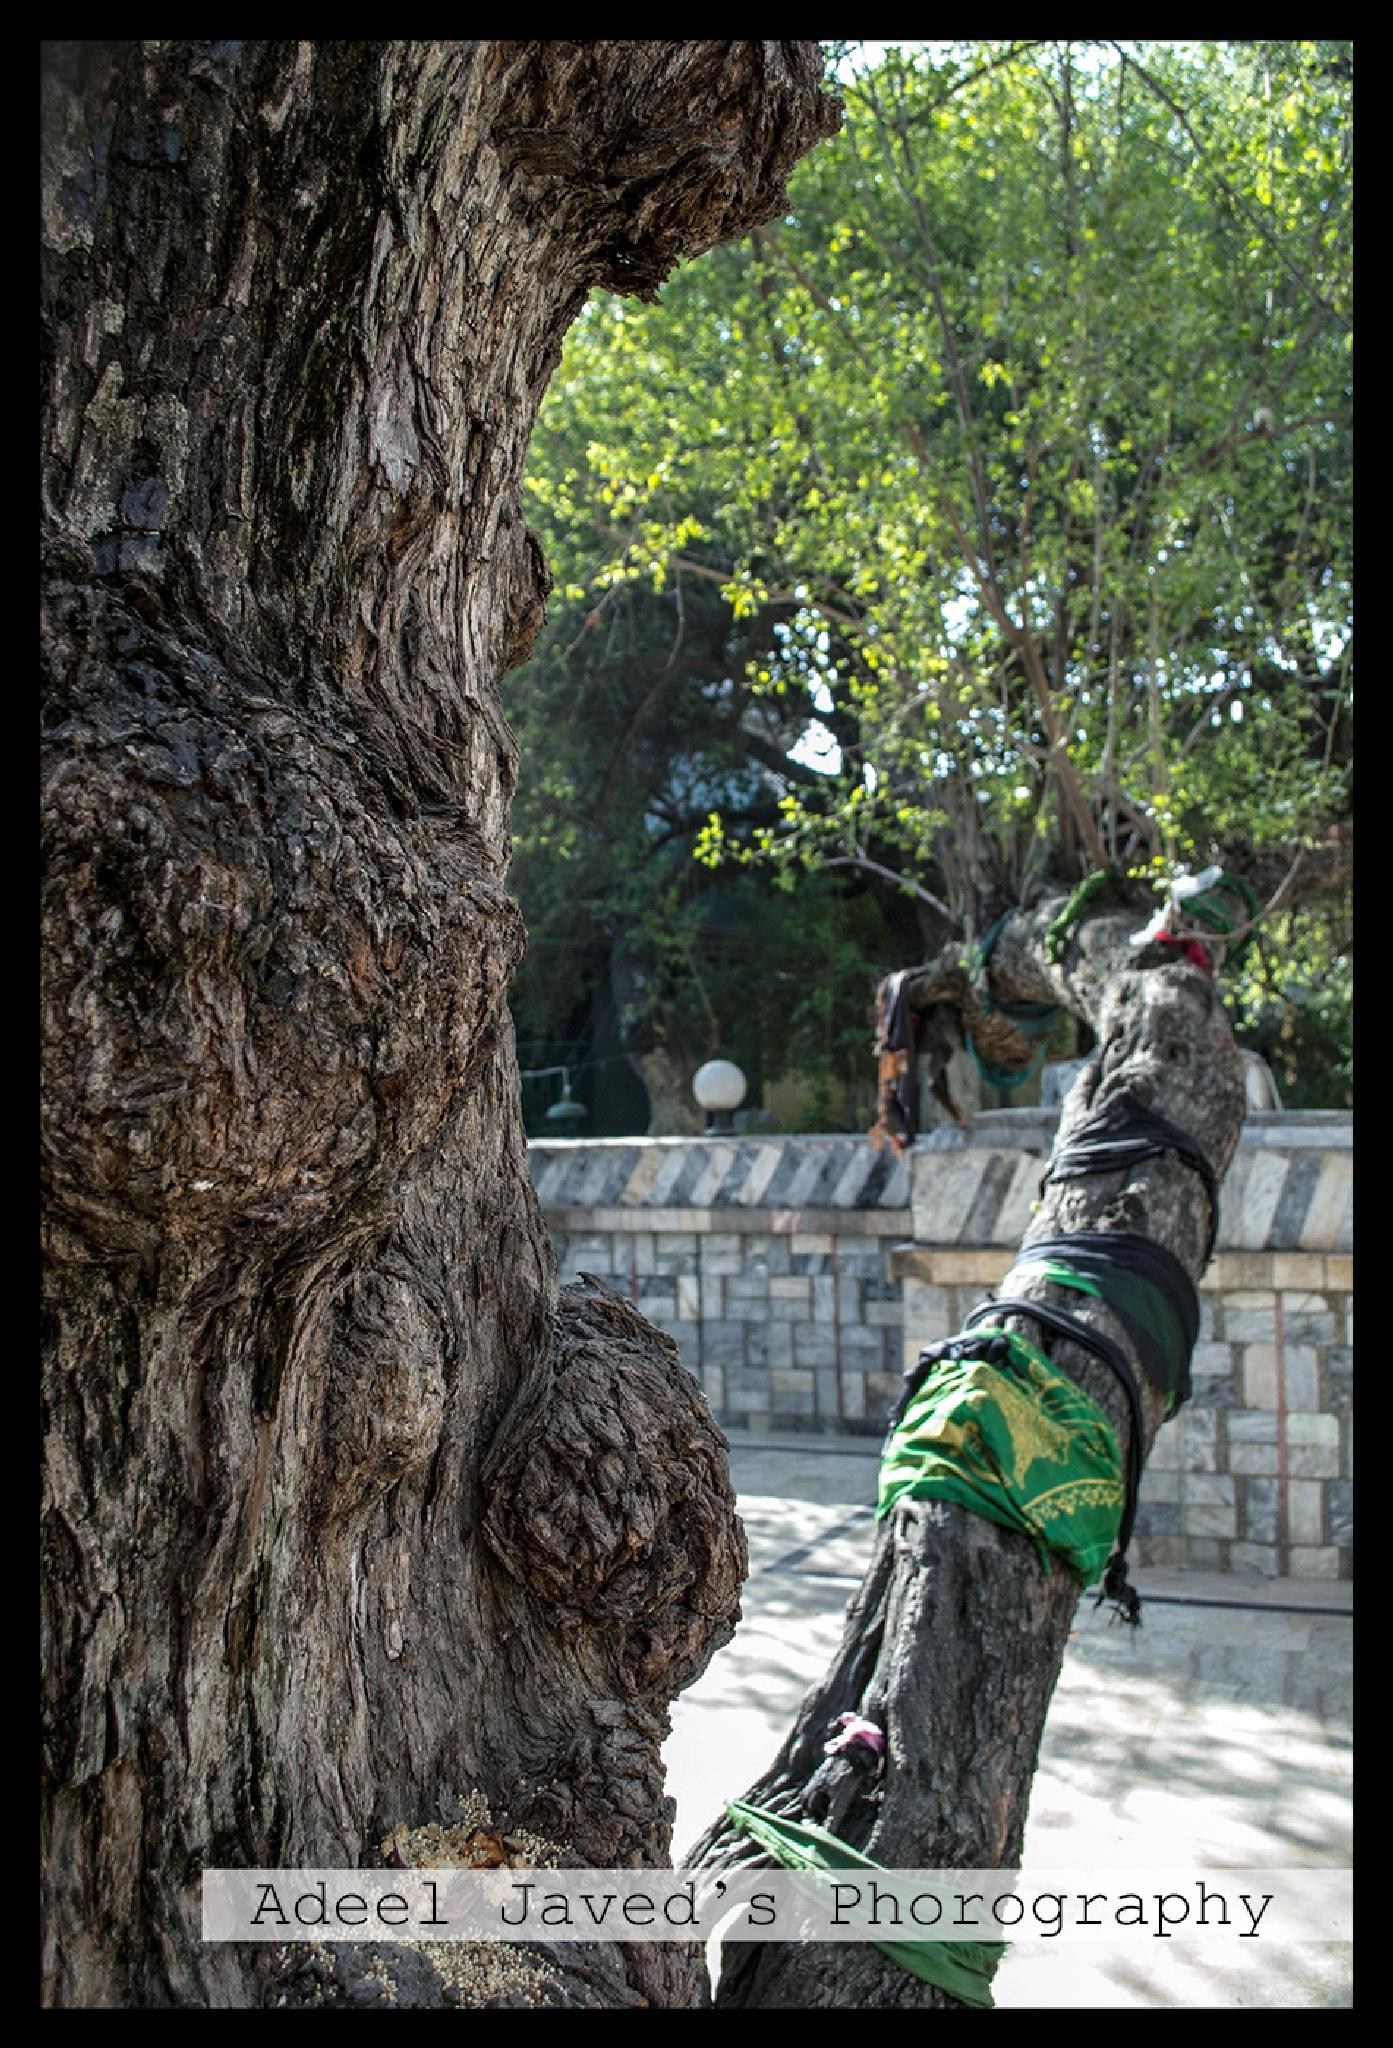 Tree View by Adeel Javed